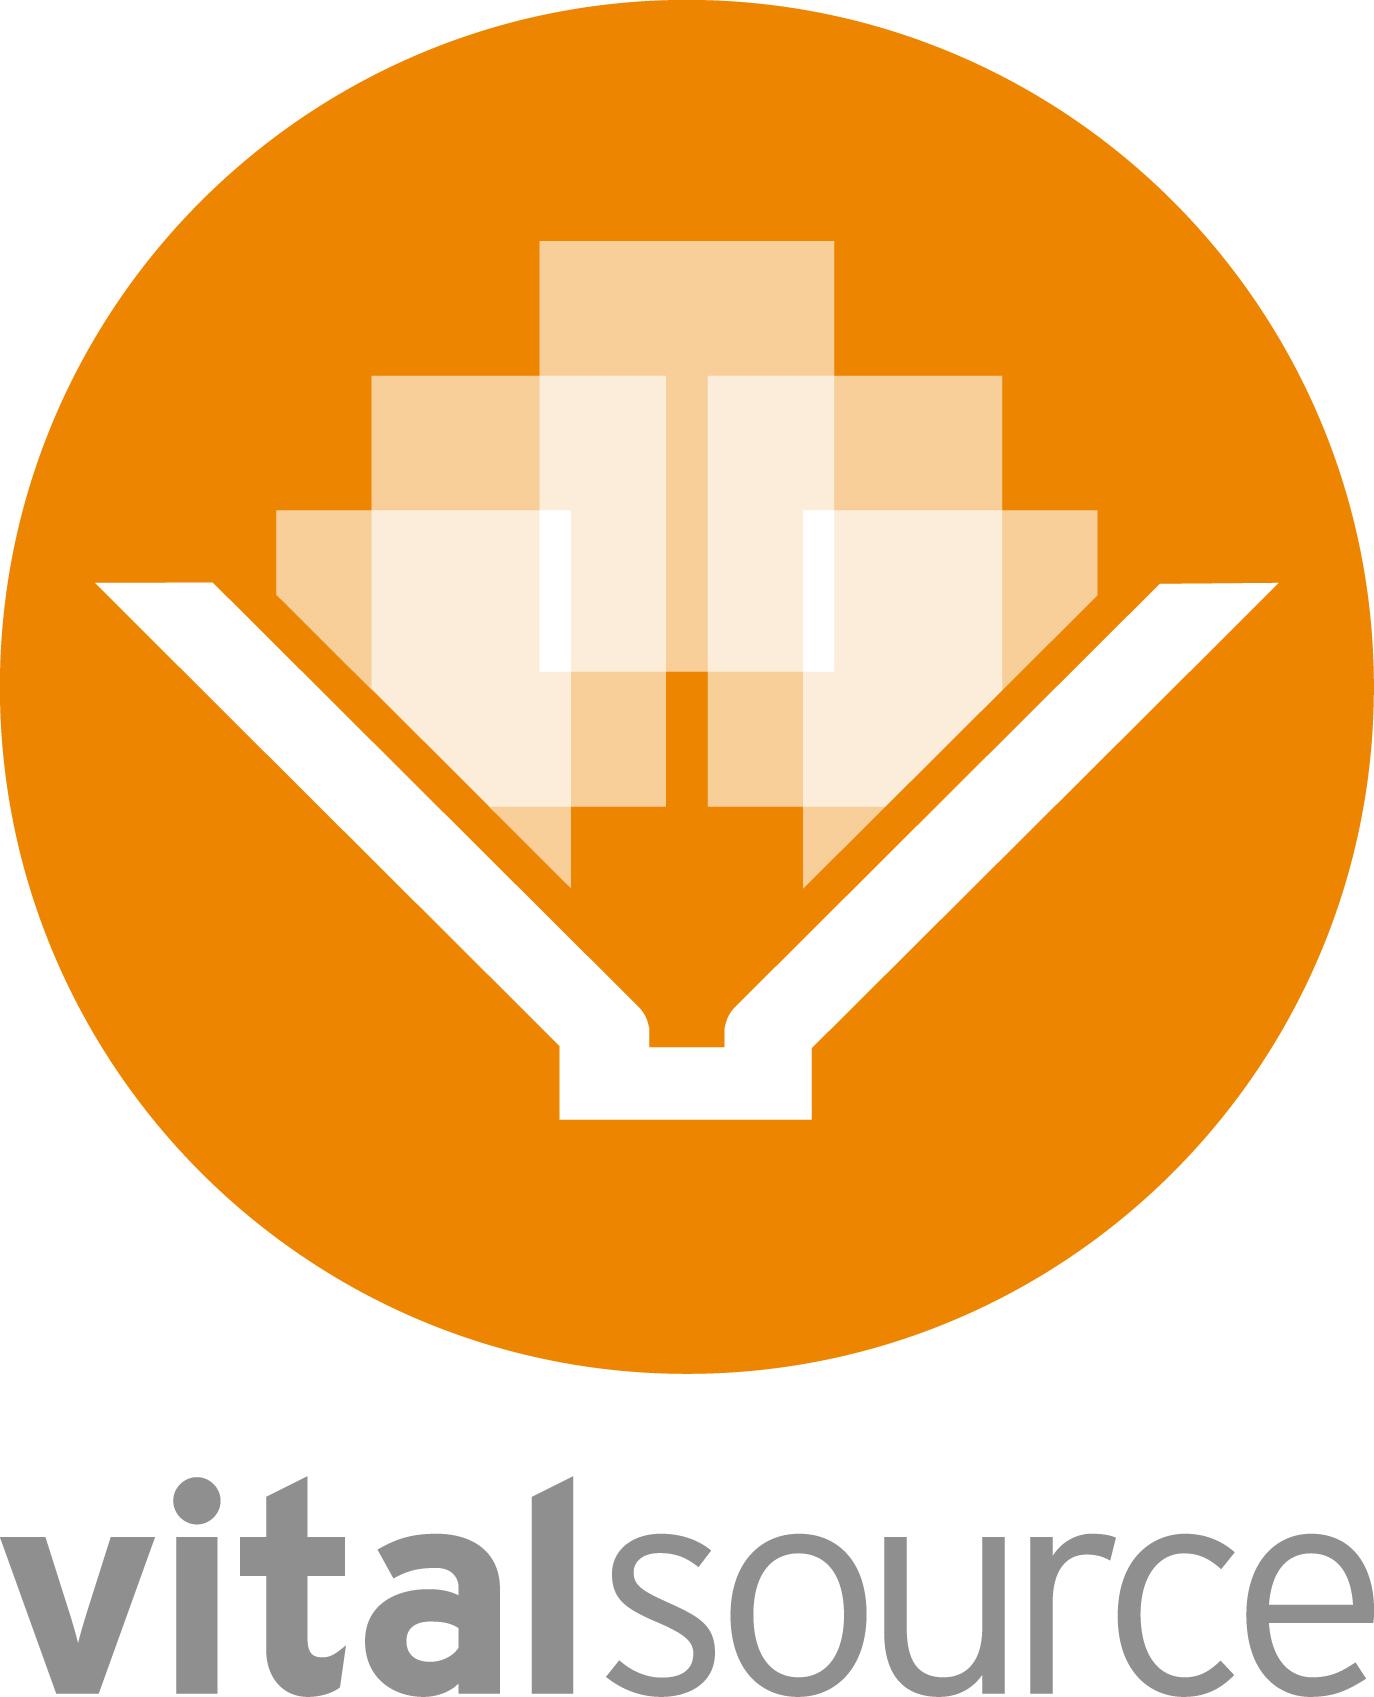 vitalsource logo.jpg